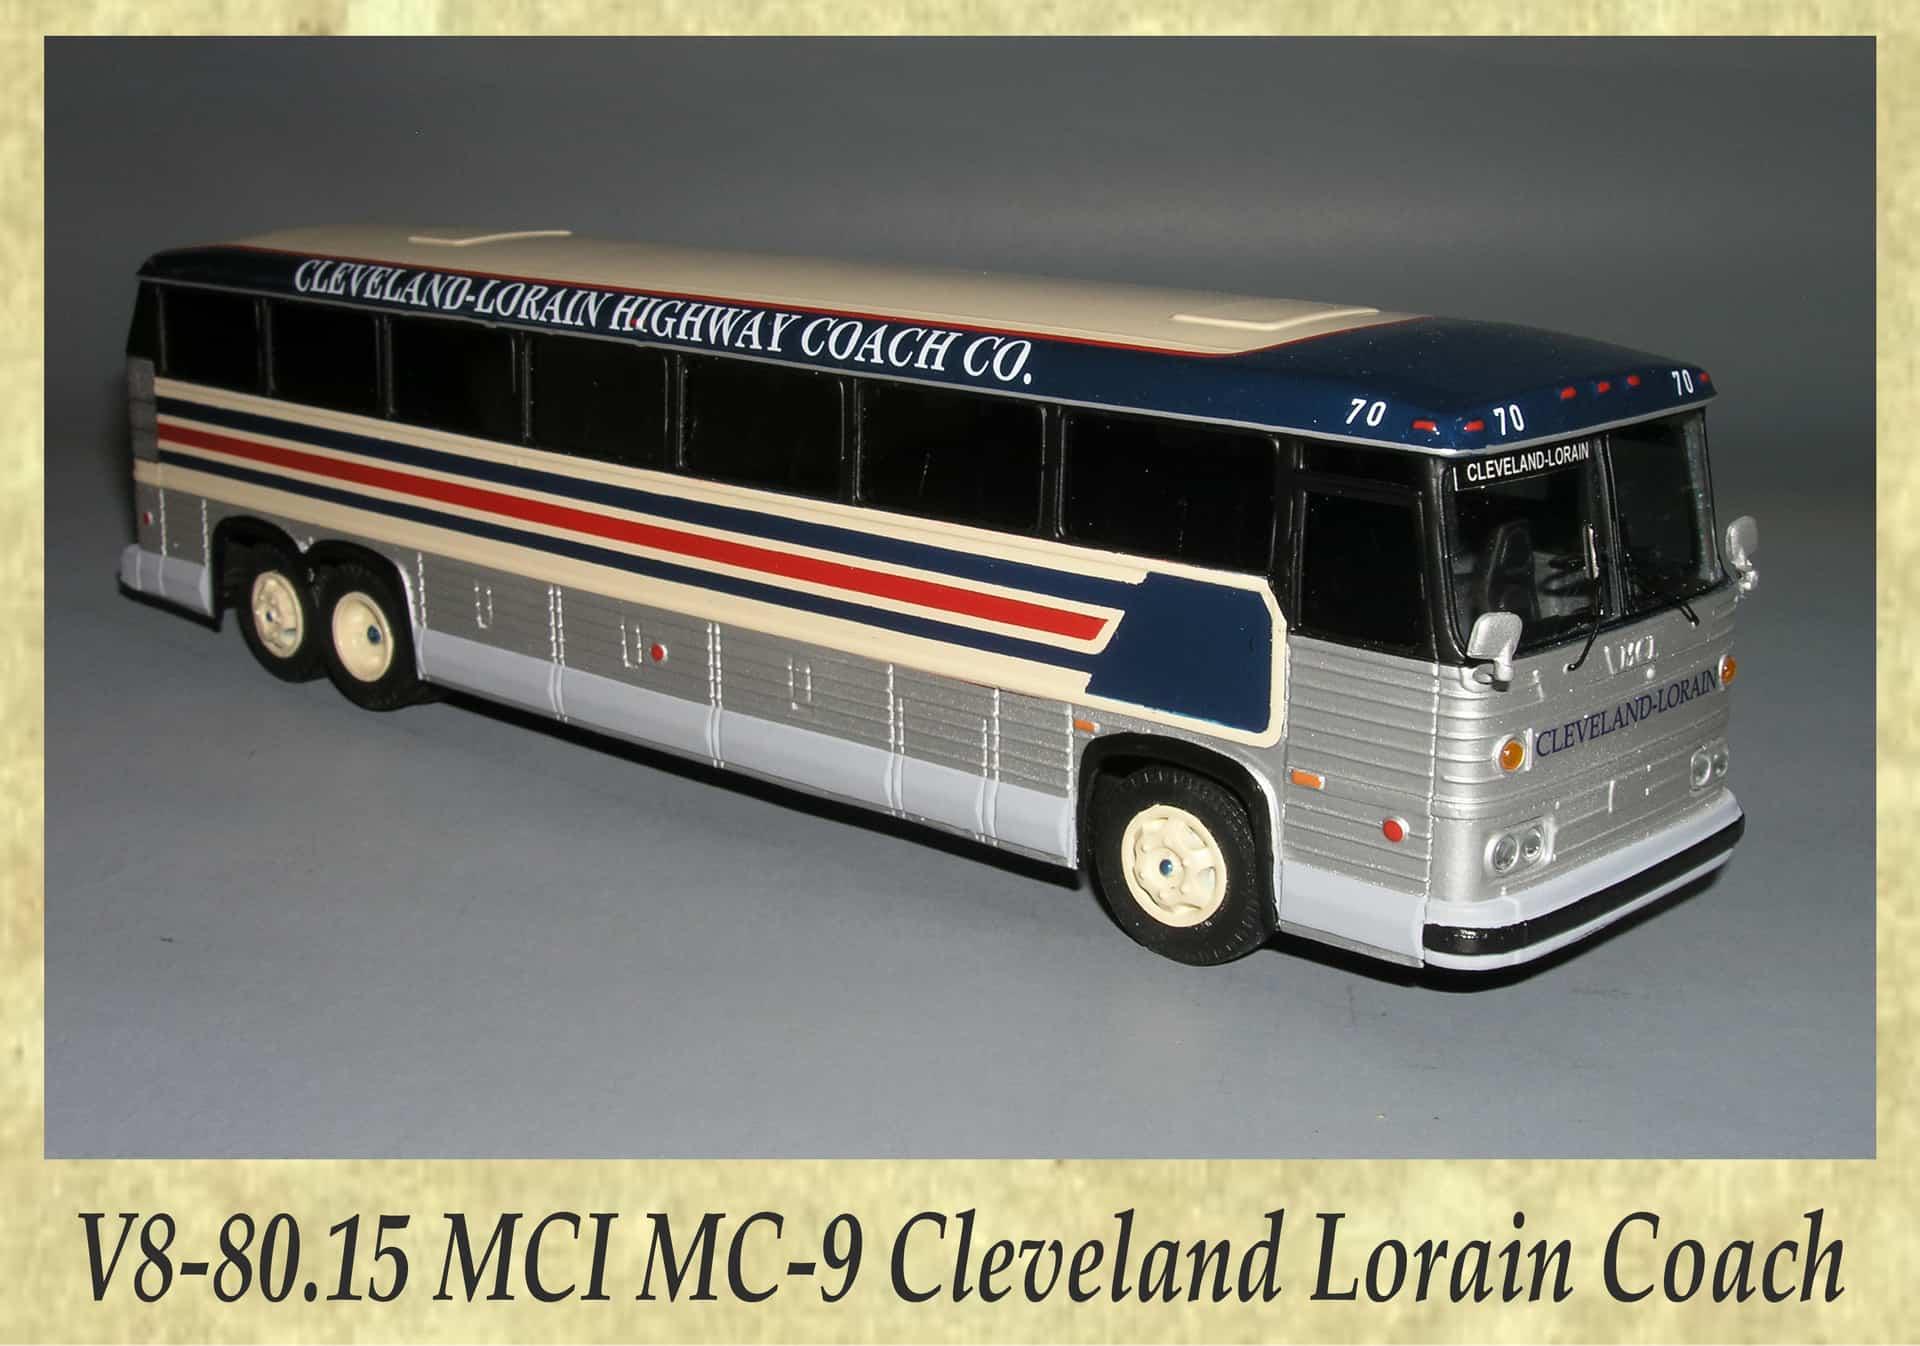 V8-80.15 MCI MC-9 Cleveland Lorain Coach